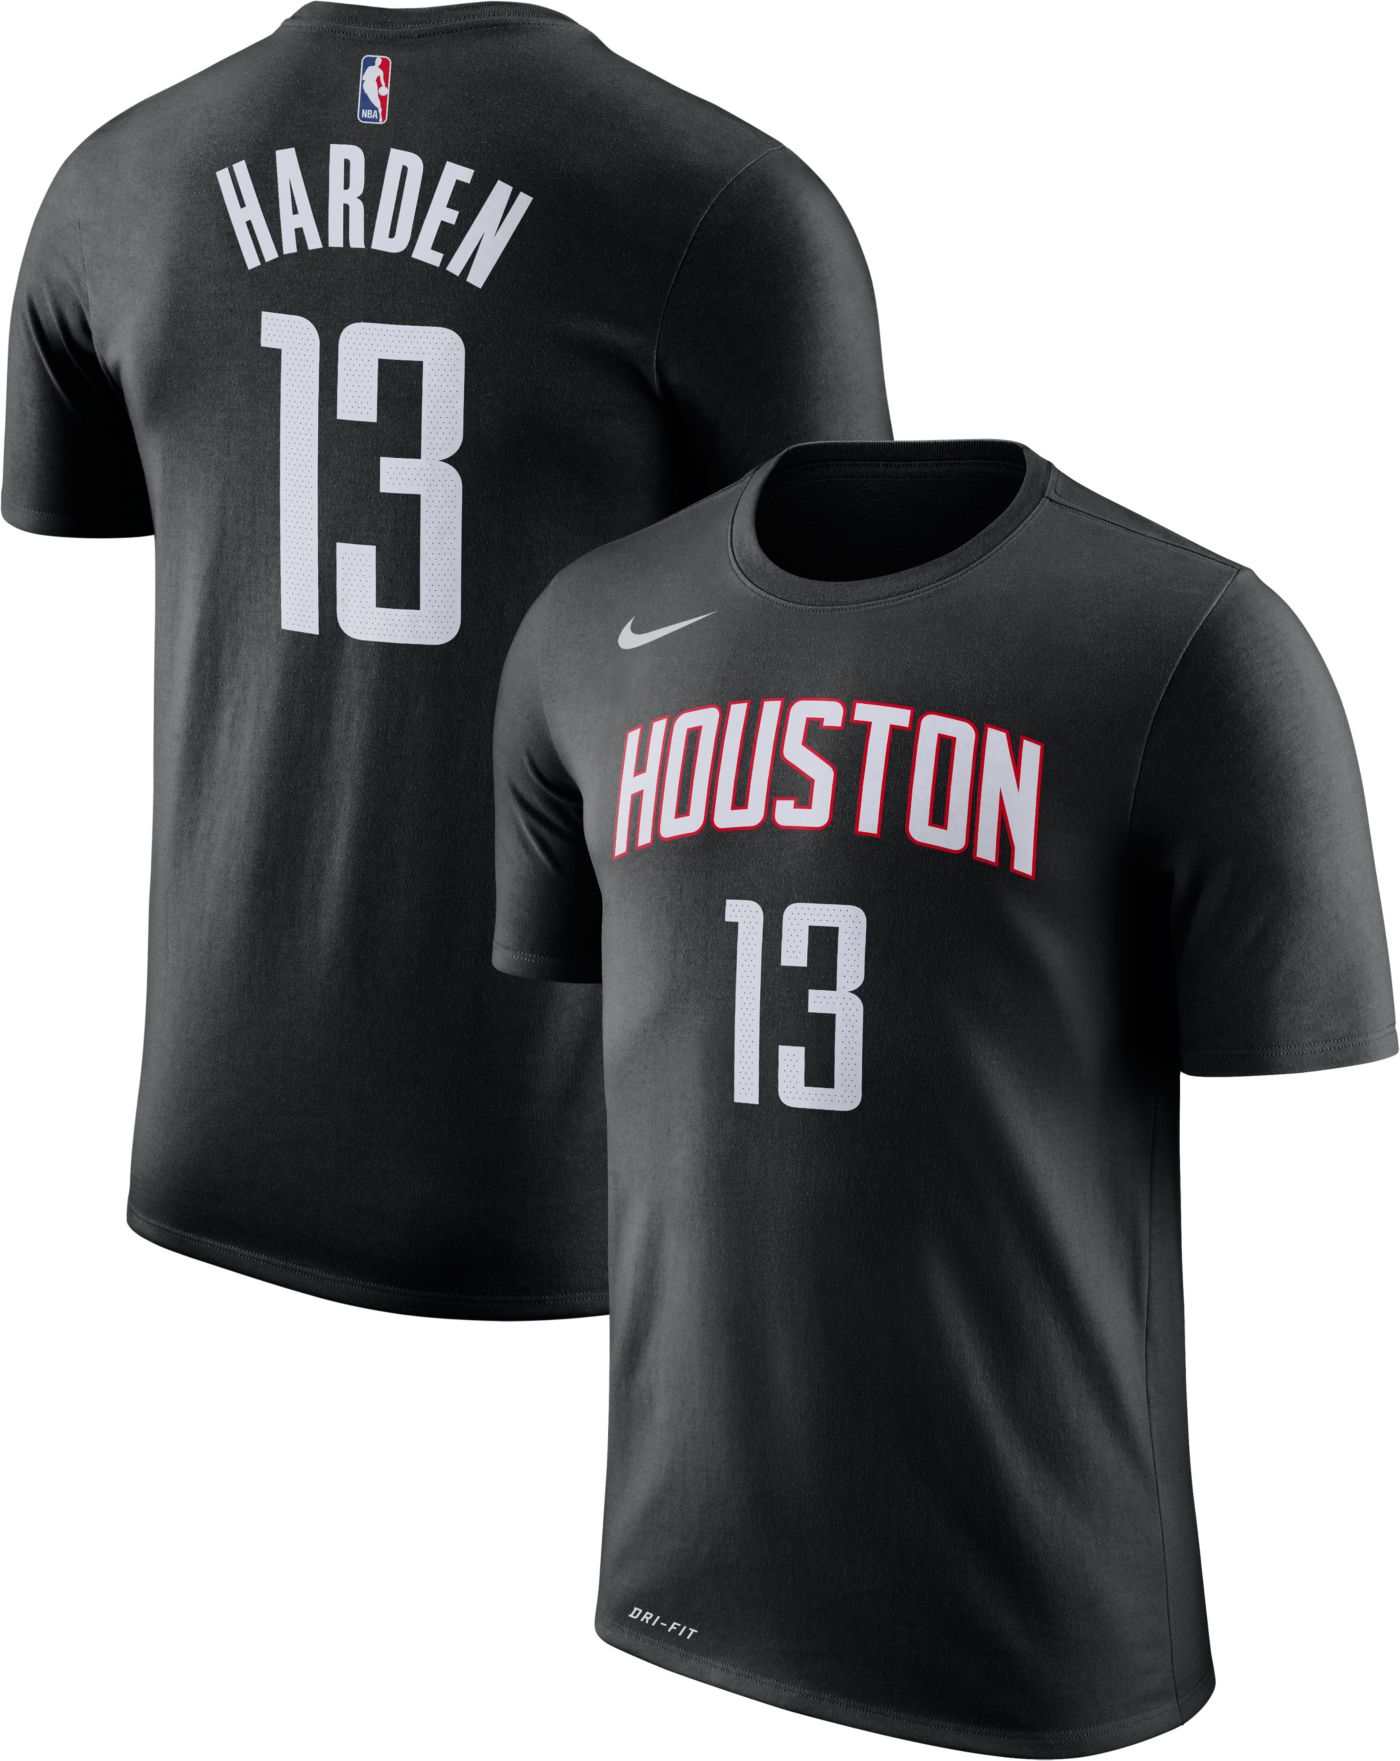 Nike Men's Houston Rockets James Harden #13 Dri-FIT Statement T-Shirt